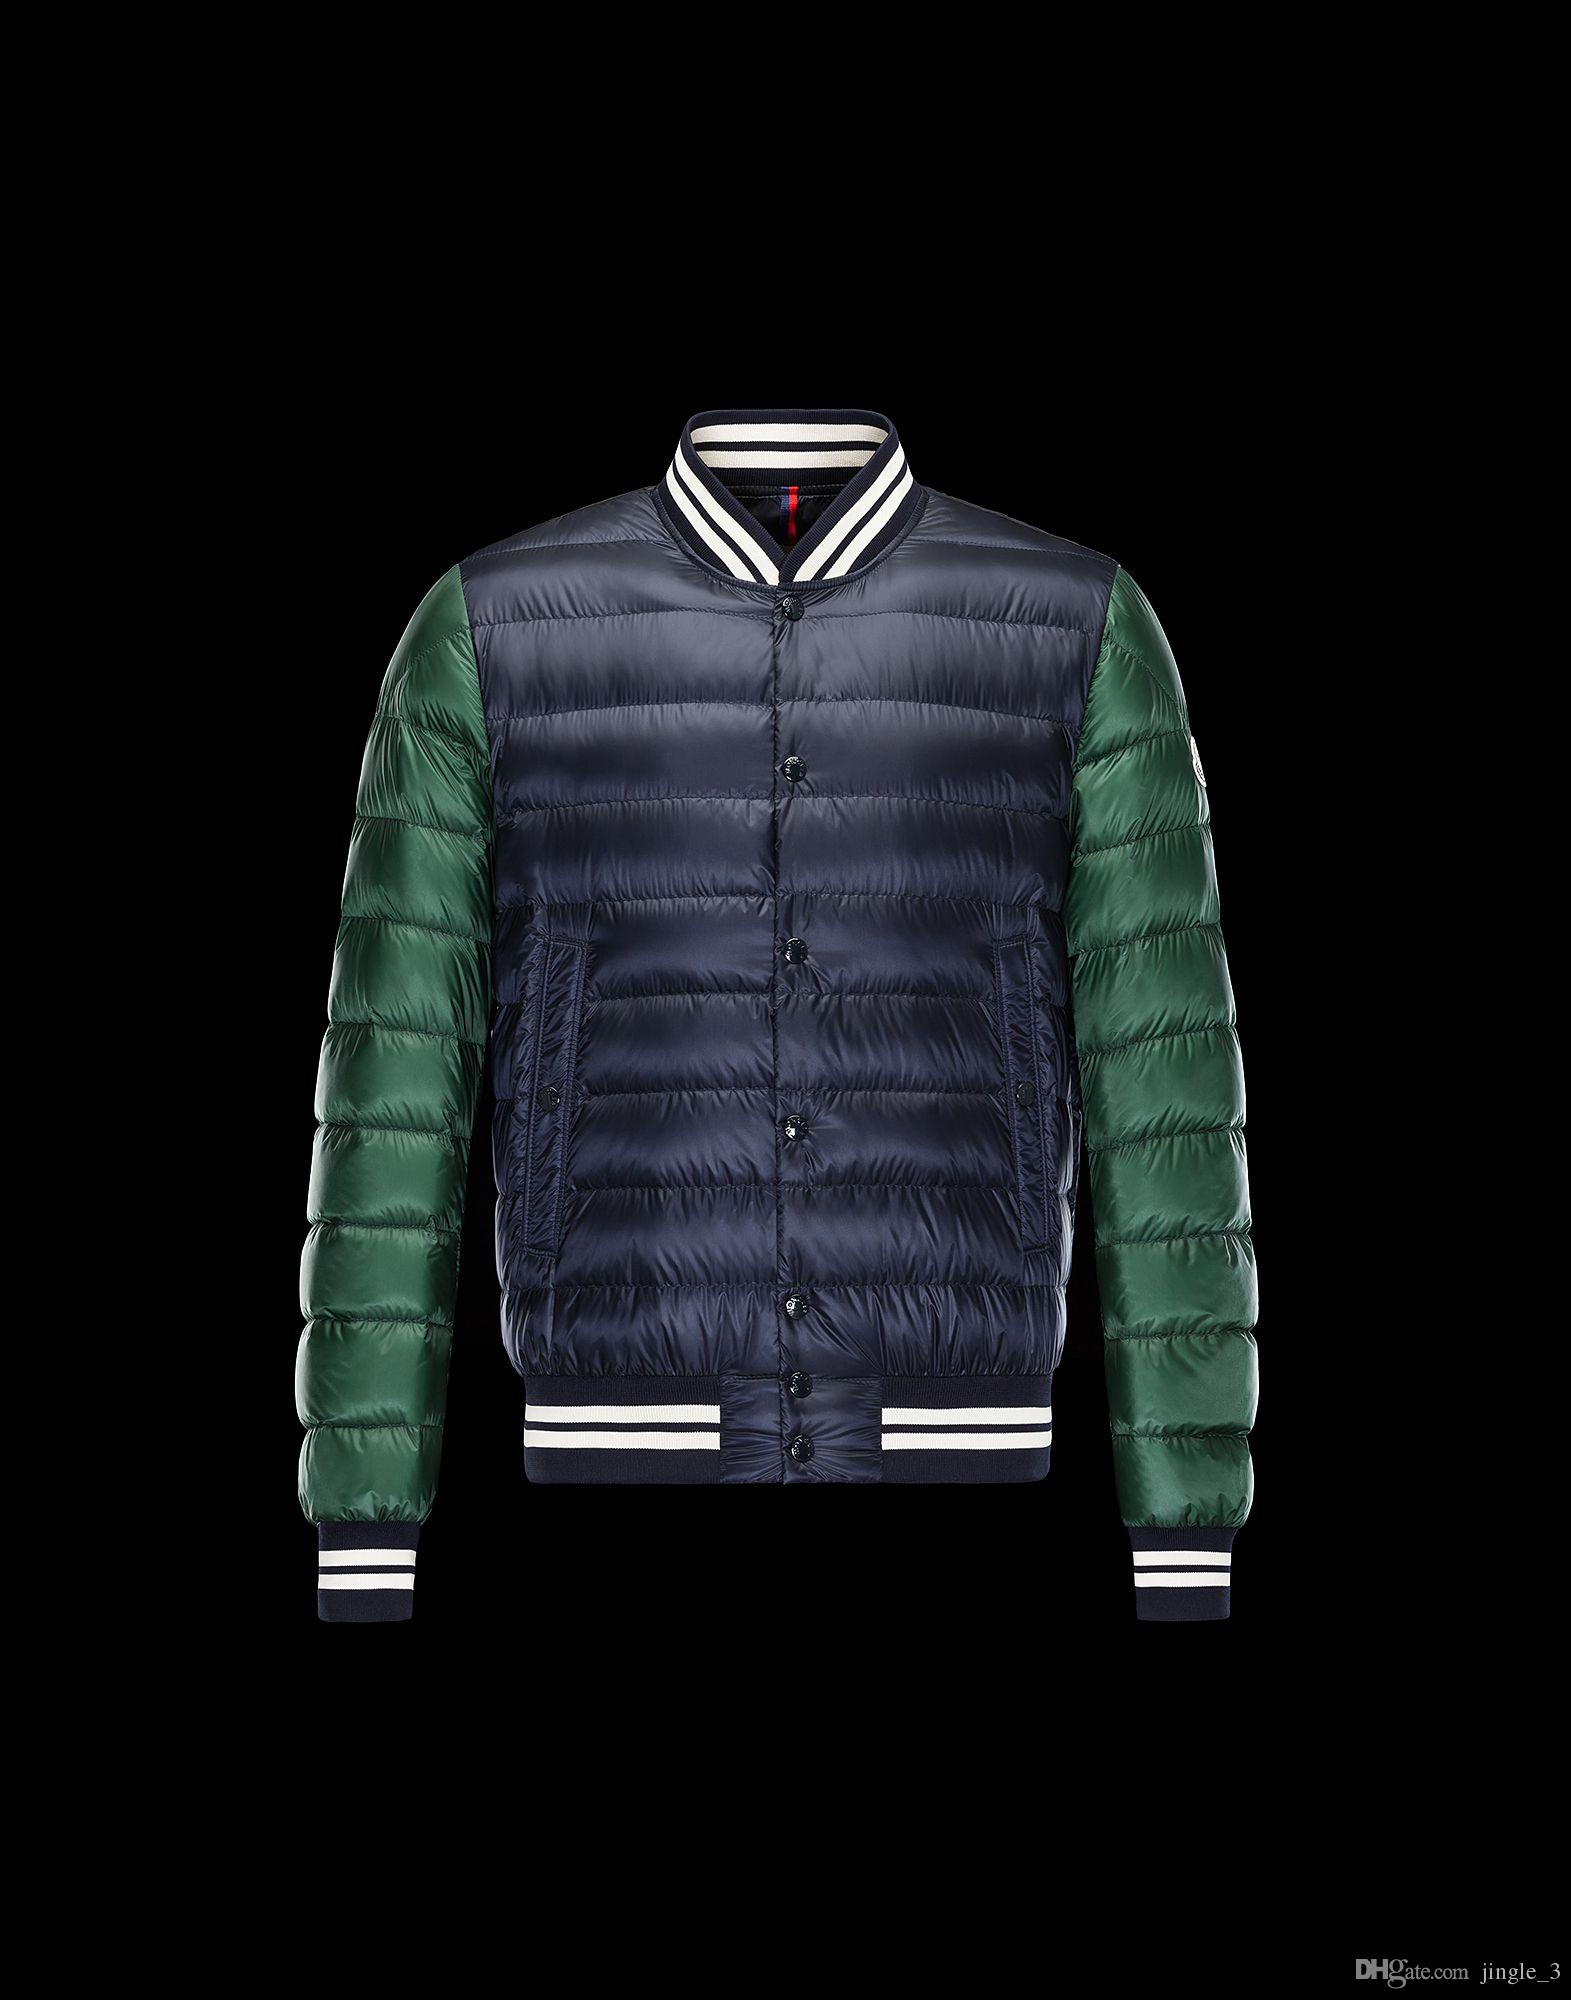 83bc0cb31 2019 Down Jacket Luxury Designers Lightweight Duck Down Coats 90% Winter  Warm Clothes Short Outwear 150-1